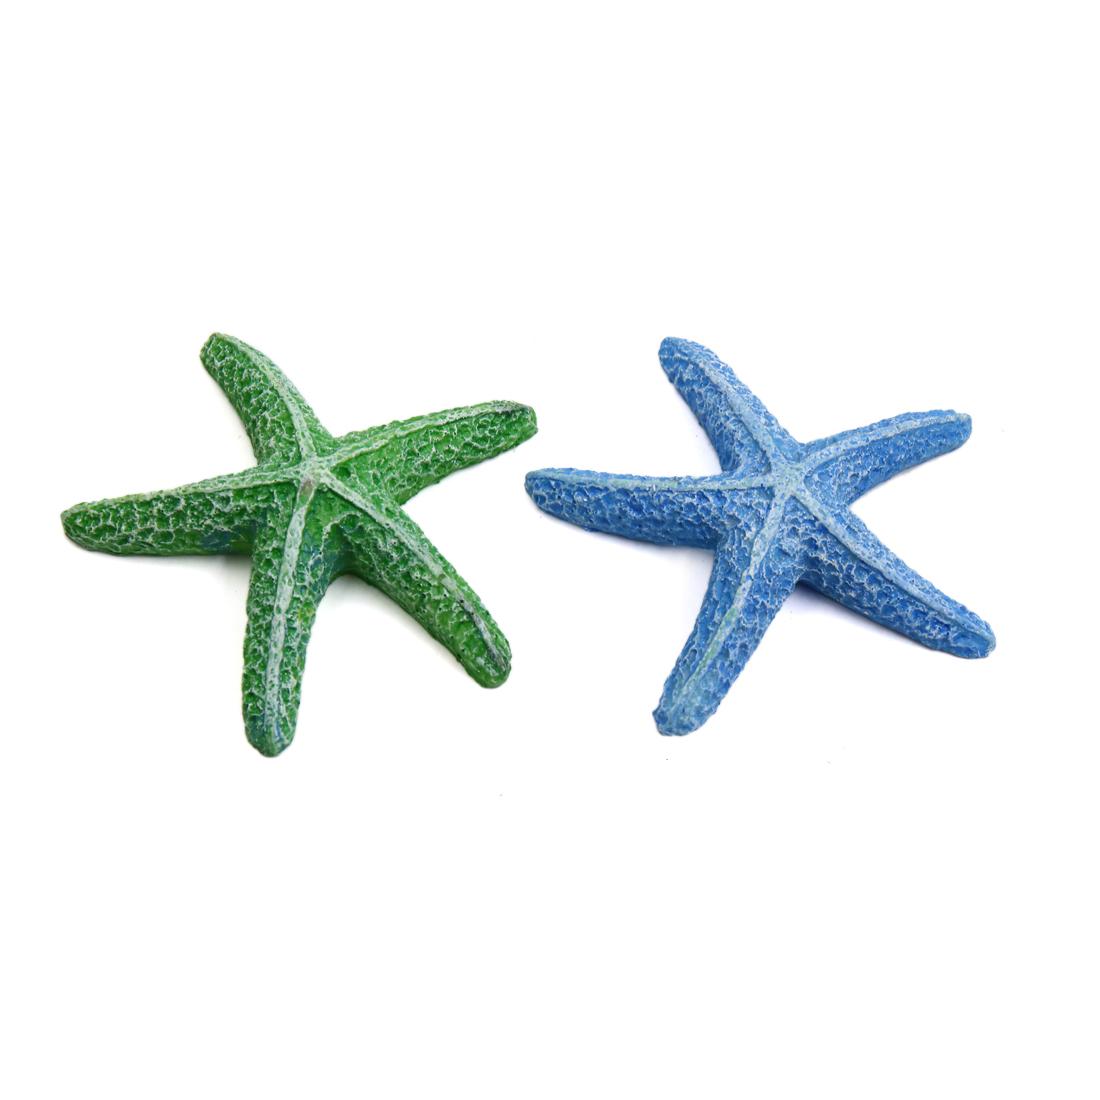 2pcs Multicolor Resin Starfish Decoration Ornament for Aquarium Betta Fish Tank